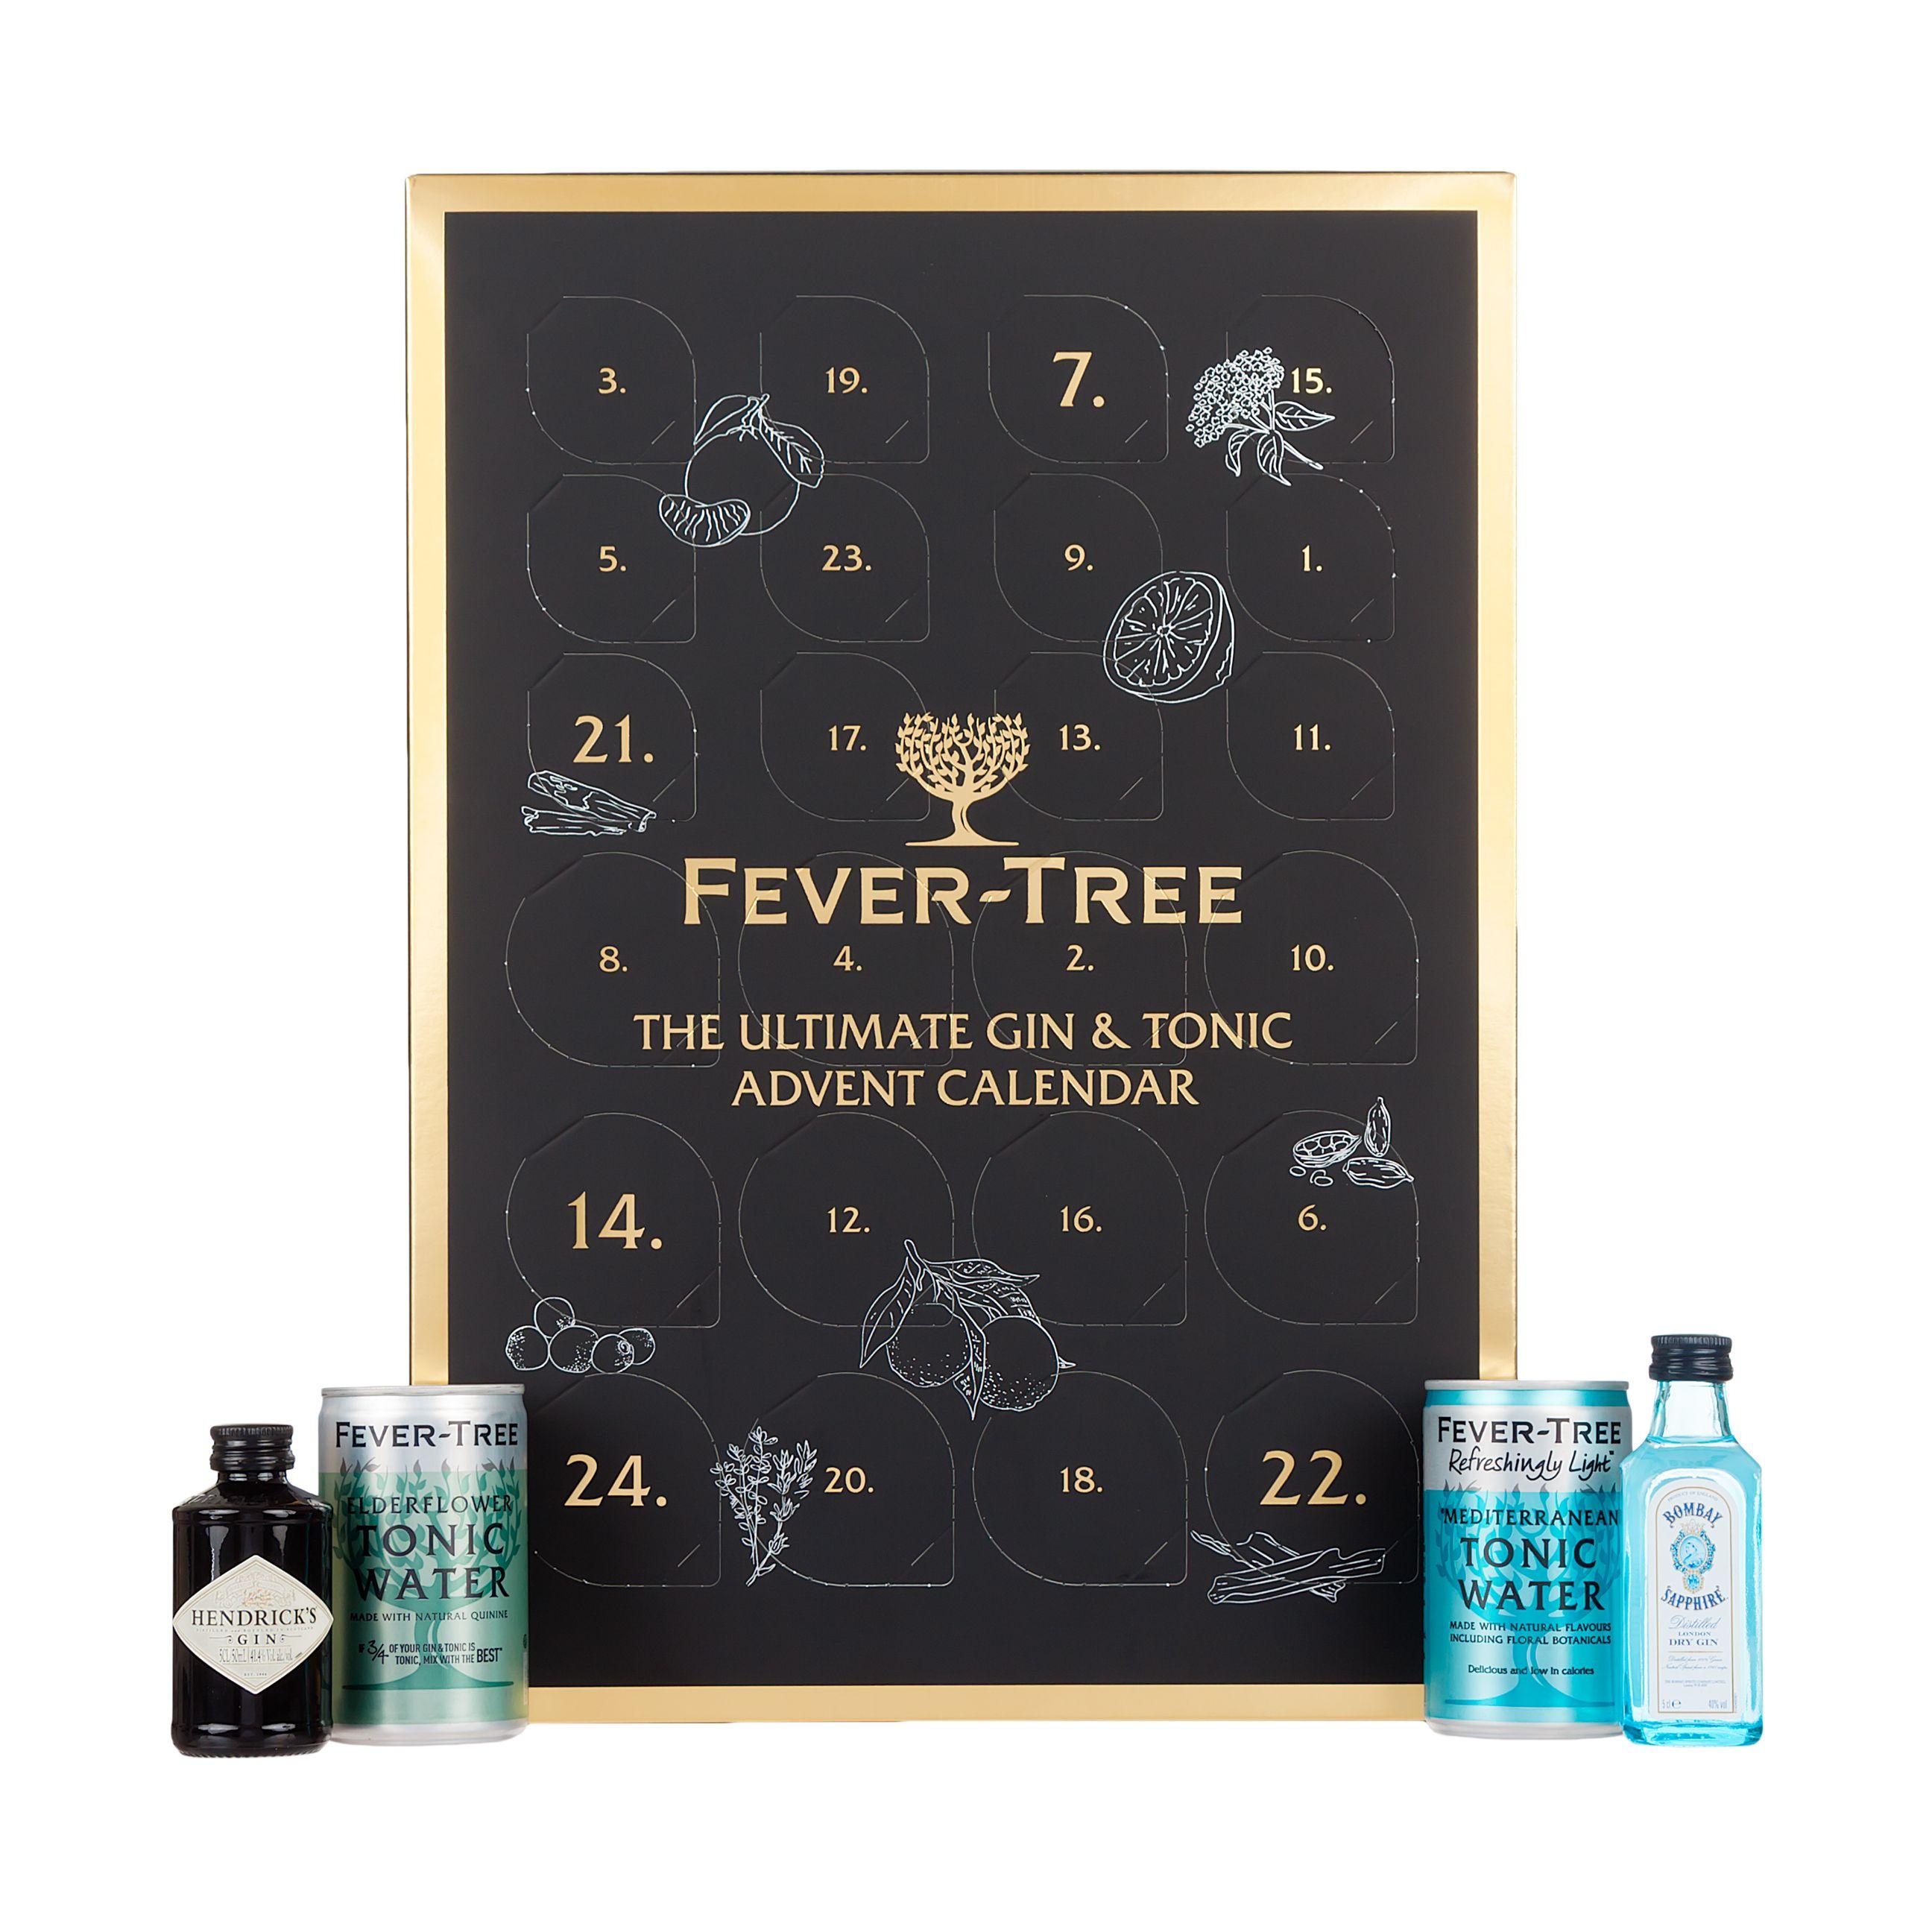 Virgin Wines Advent Calendar.Alcoholic Advent Calendars The Best Alcohol Advent Calendars For 2018